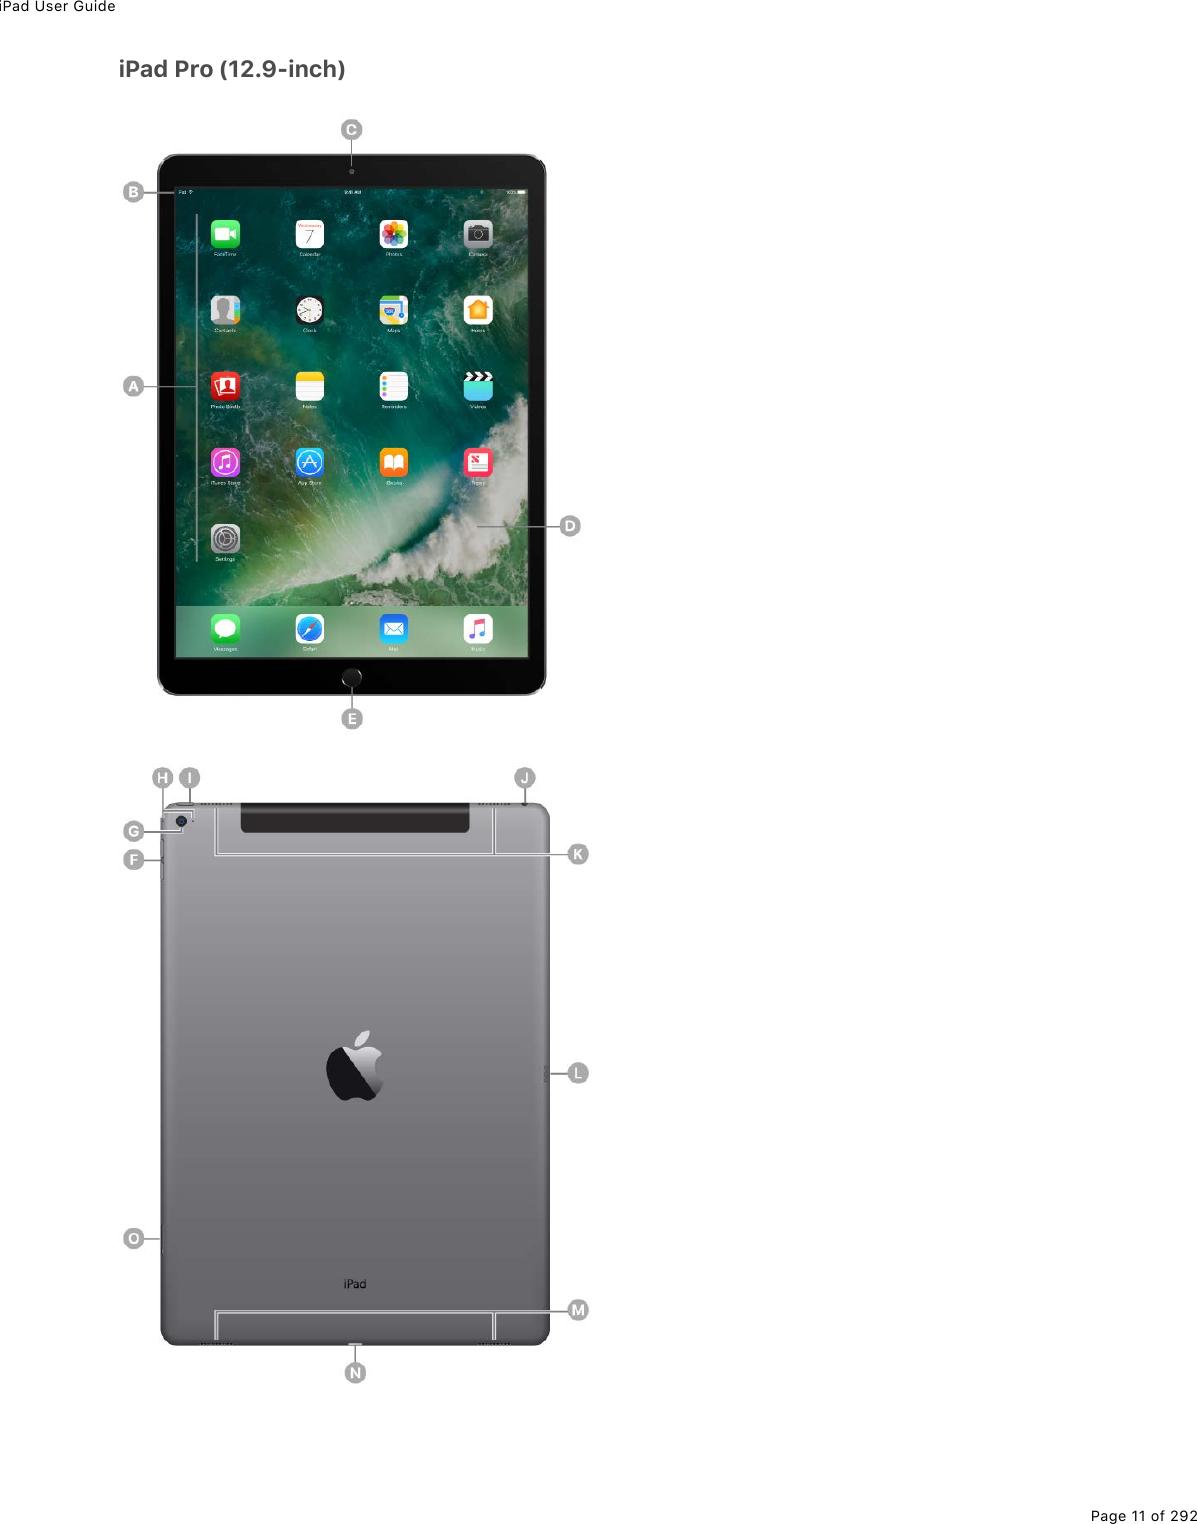 apple ipad user guide ibooks